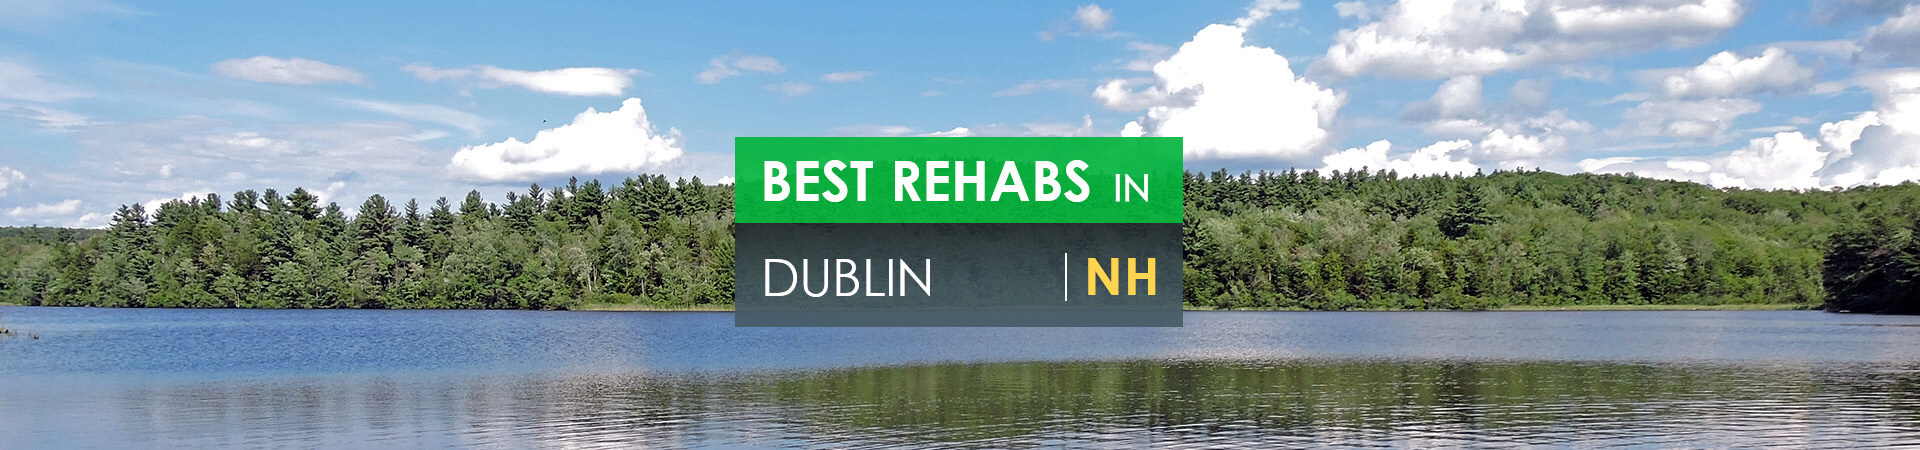 Best rehabs in Dublin, NH